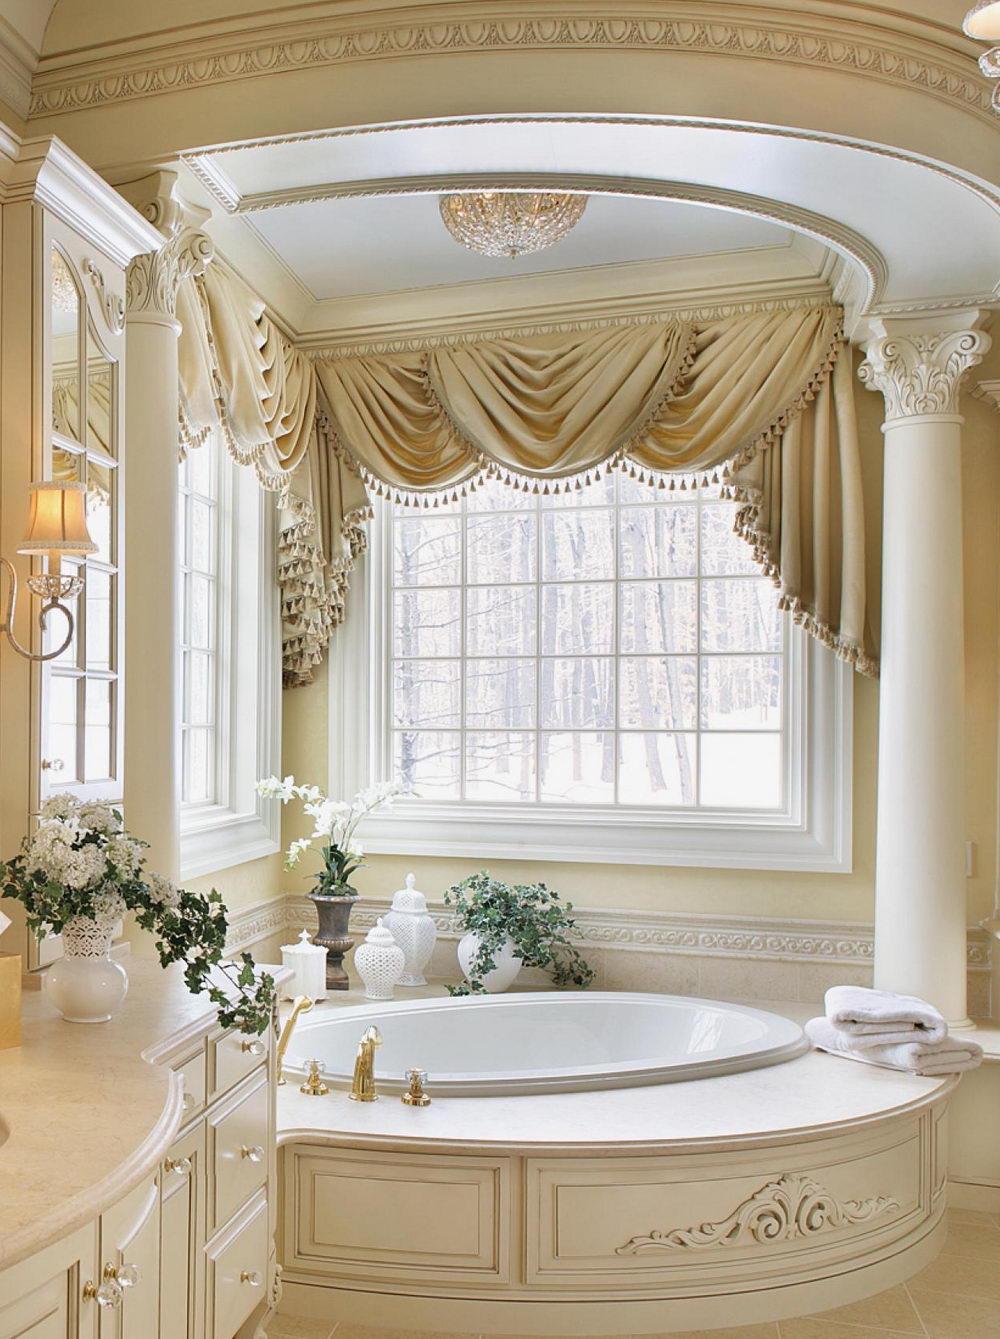 Bathroom Window Curtains  How to Buy  DecorIdeasBathroom